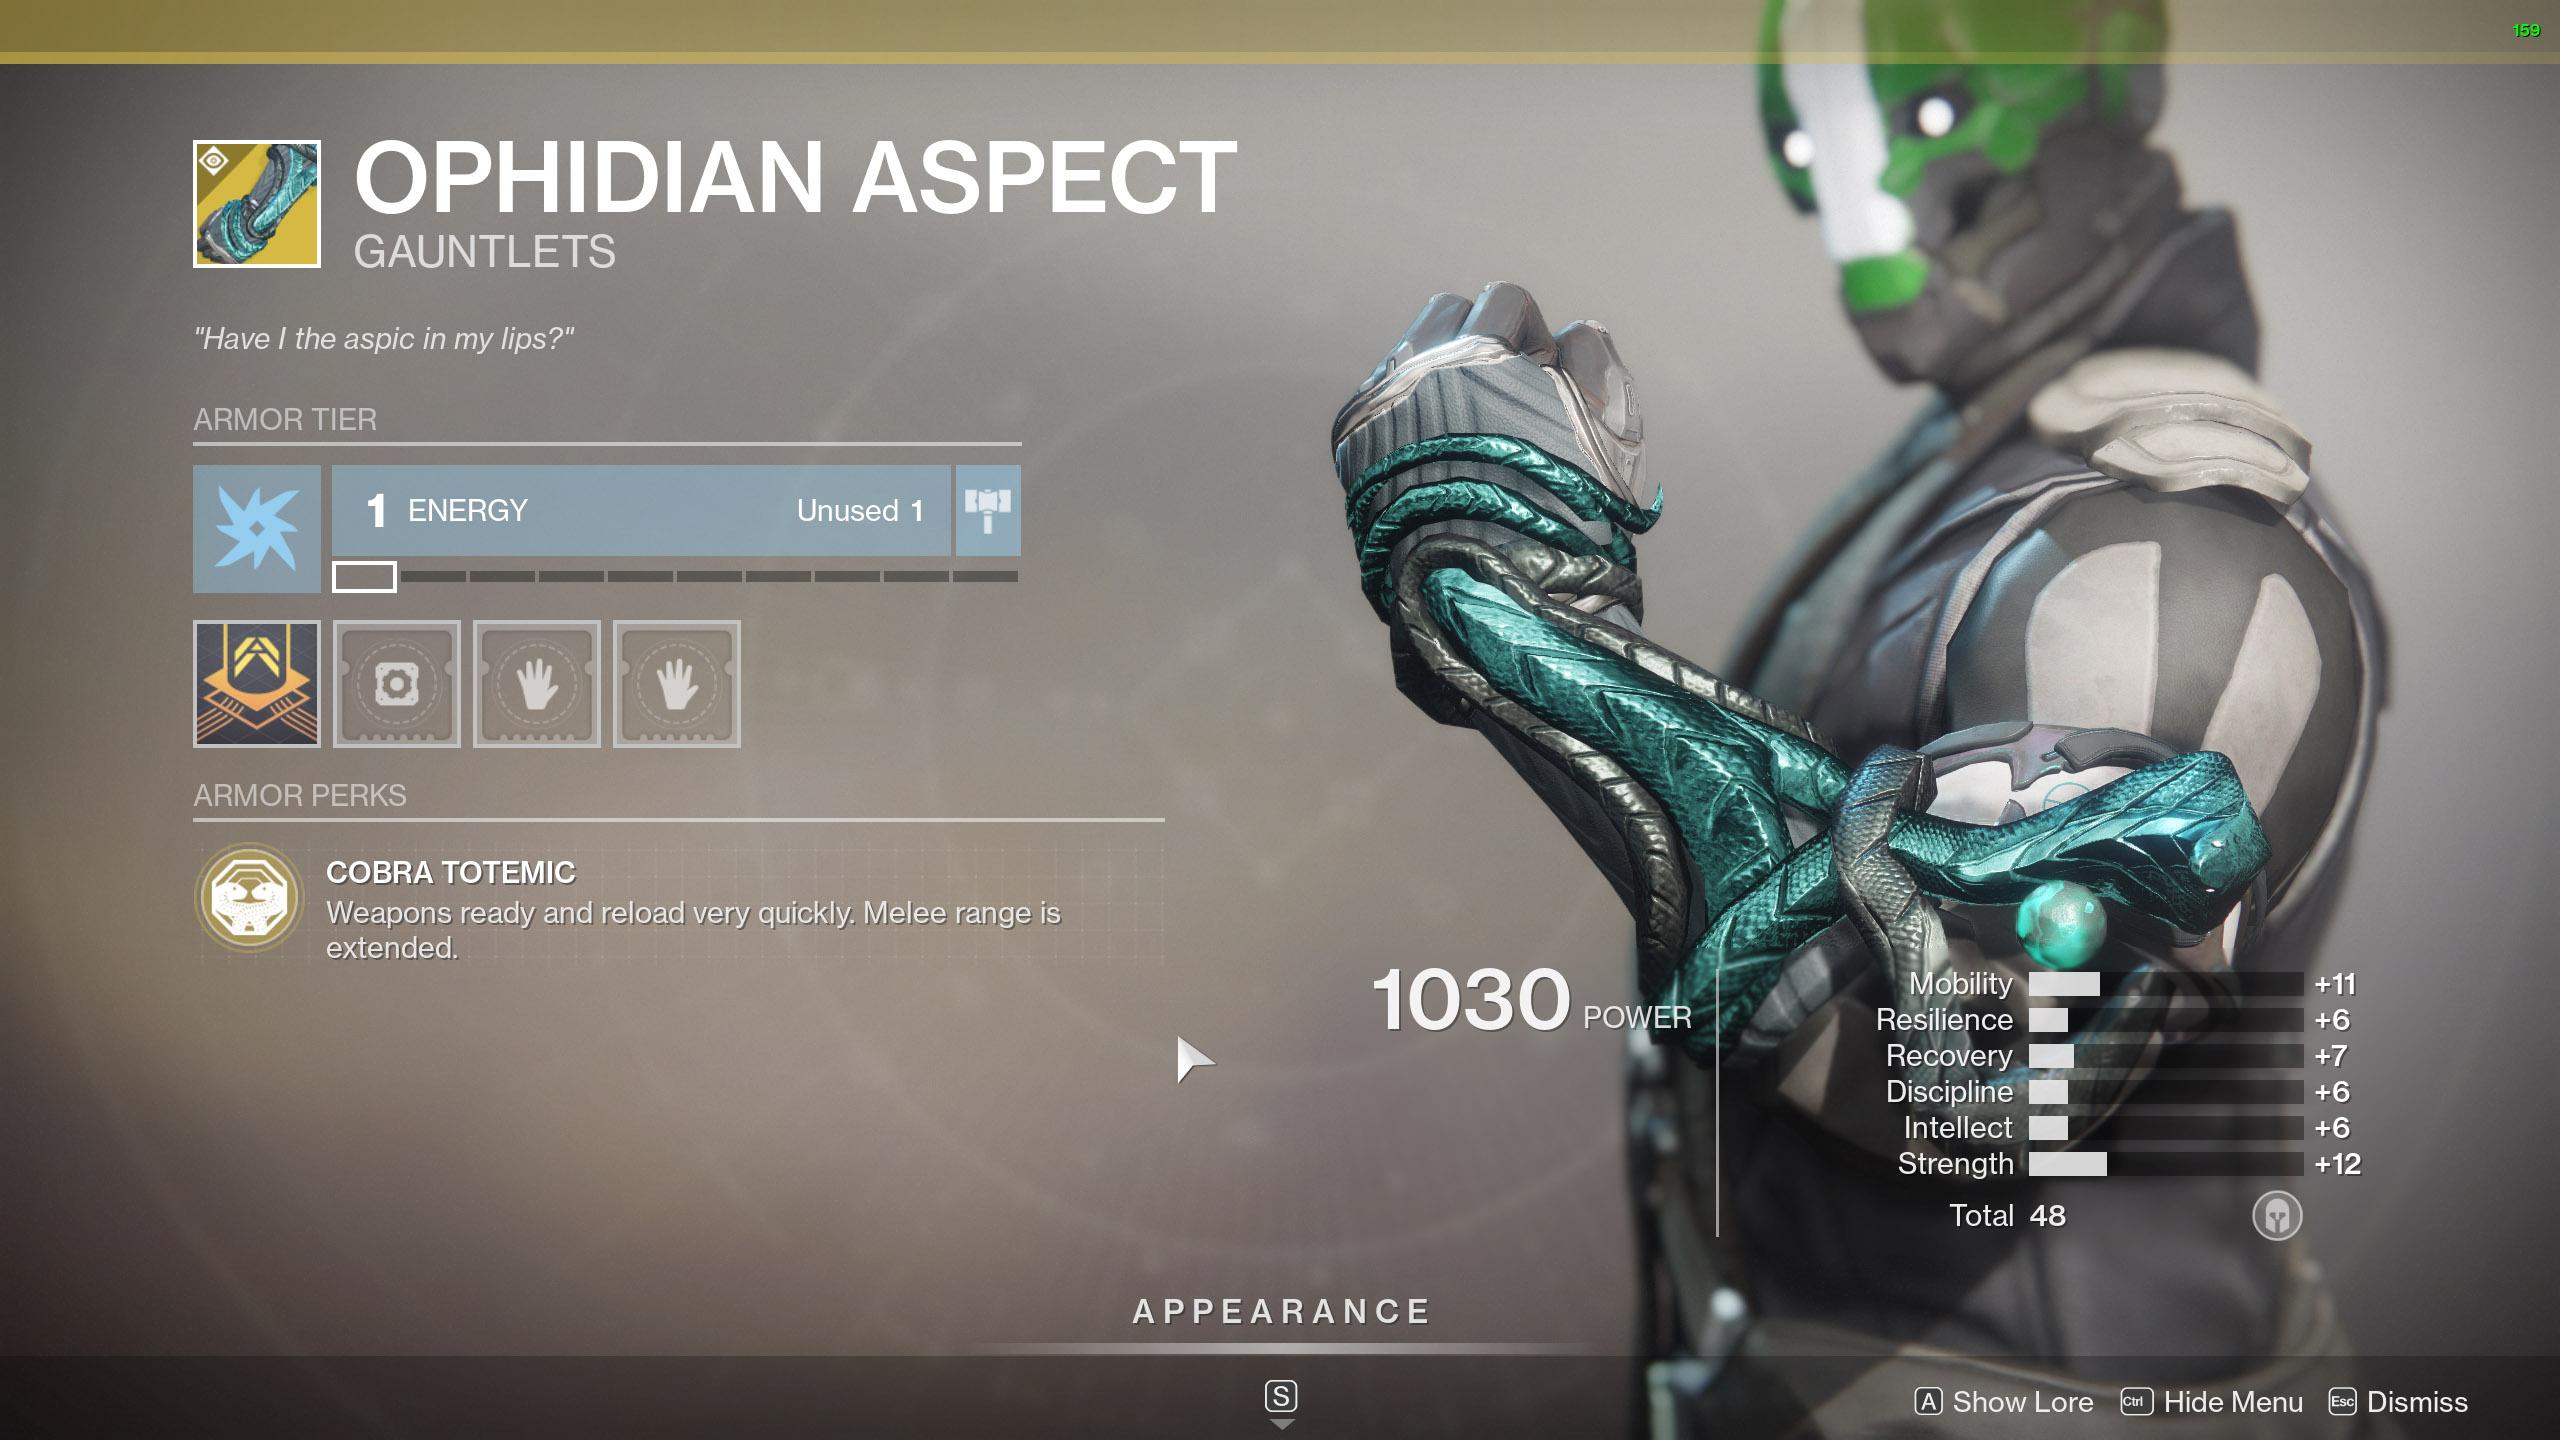 Destiny 2 Warlock Exotic Armor Ophidian Aspect